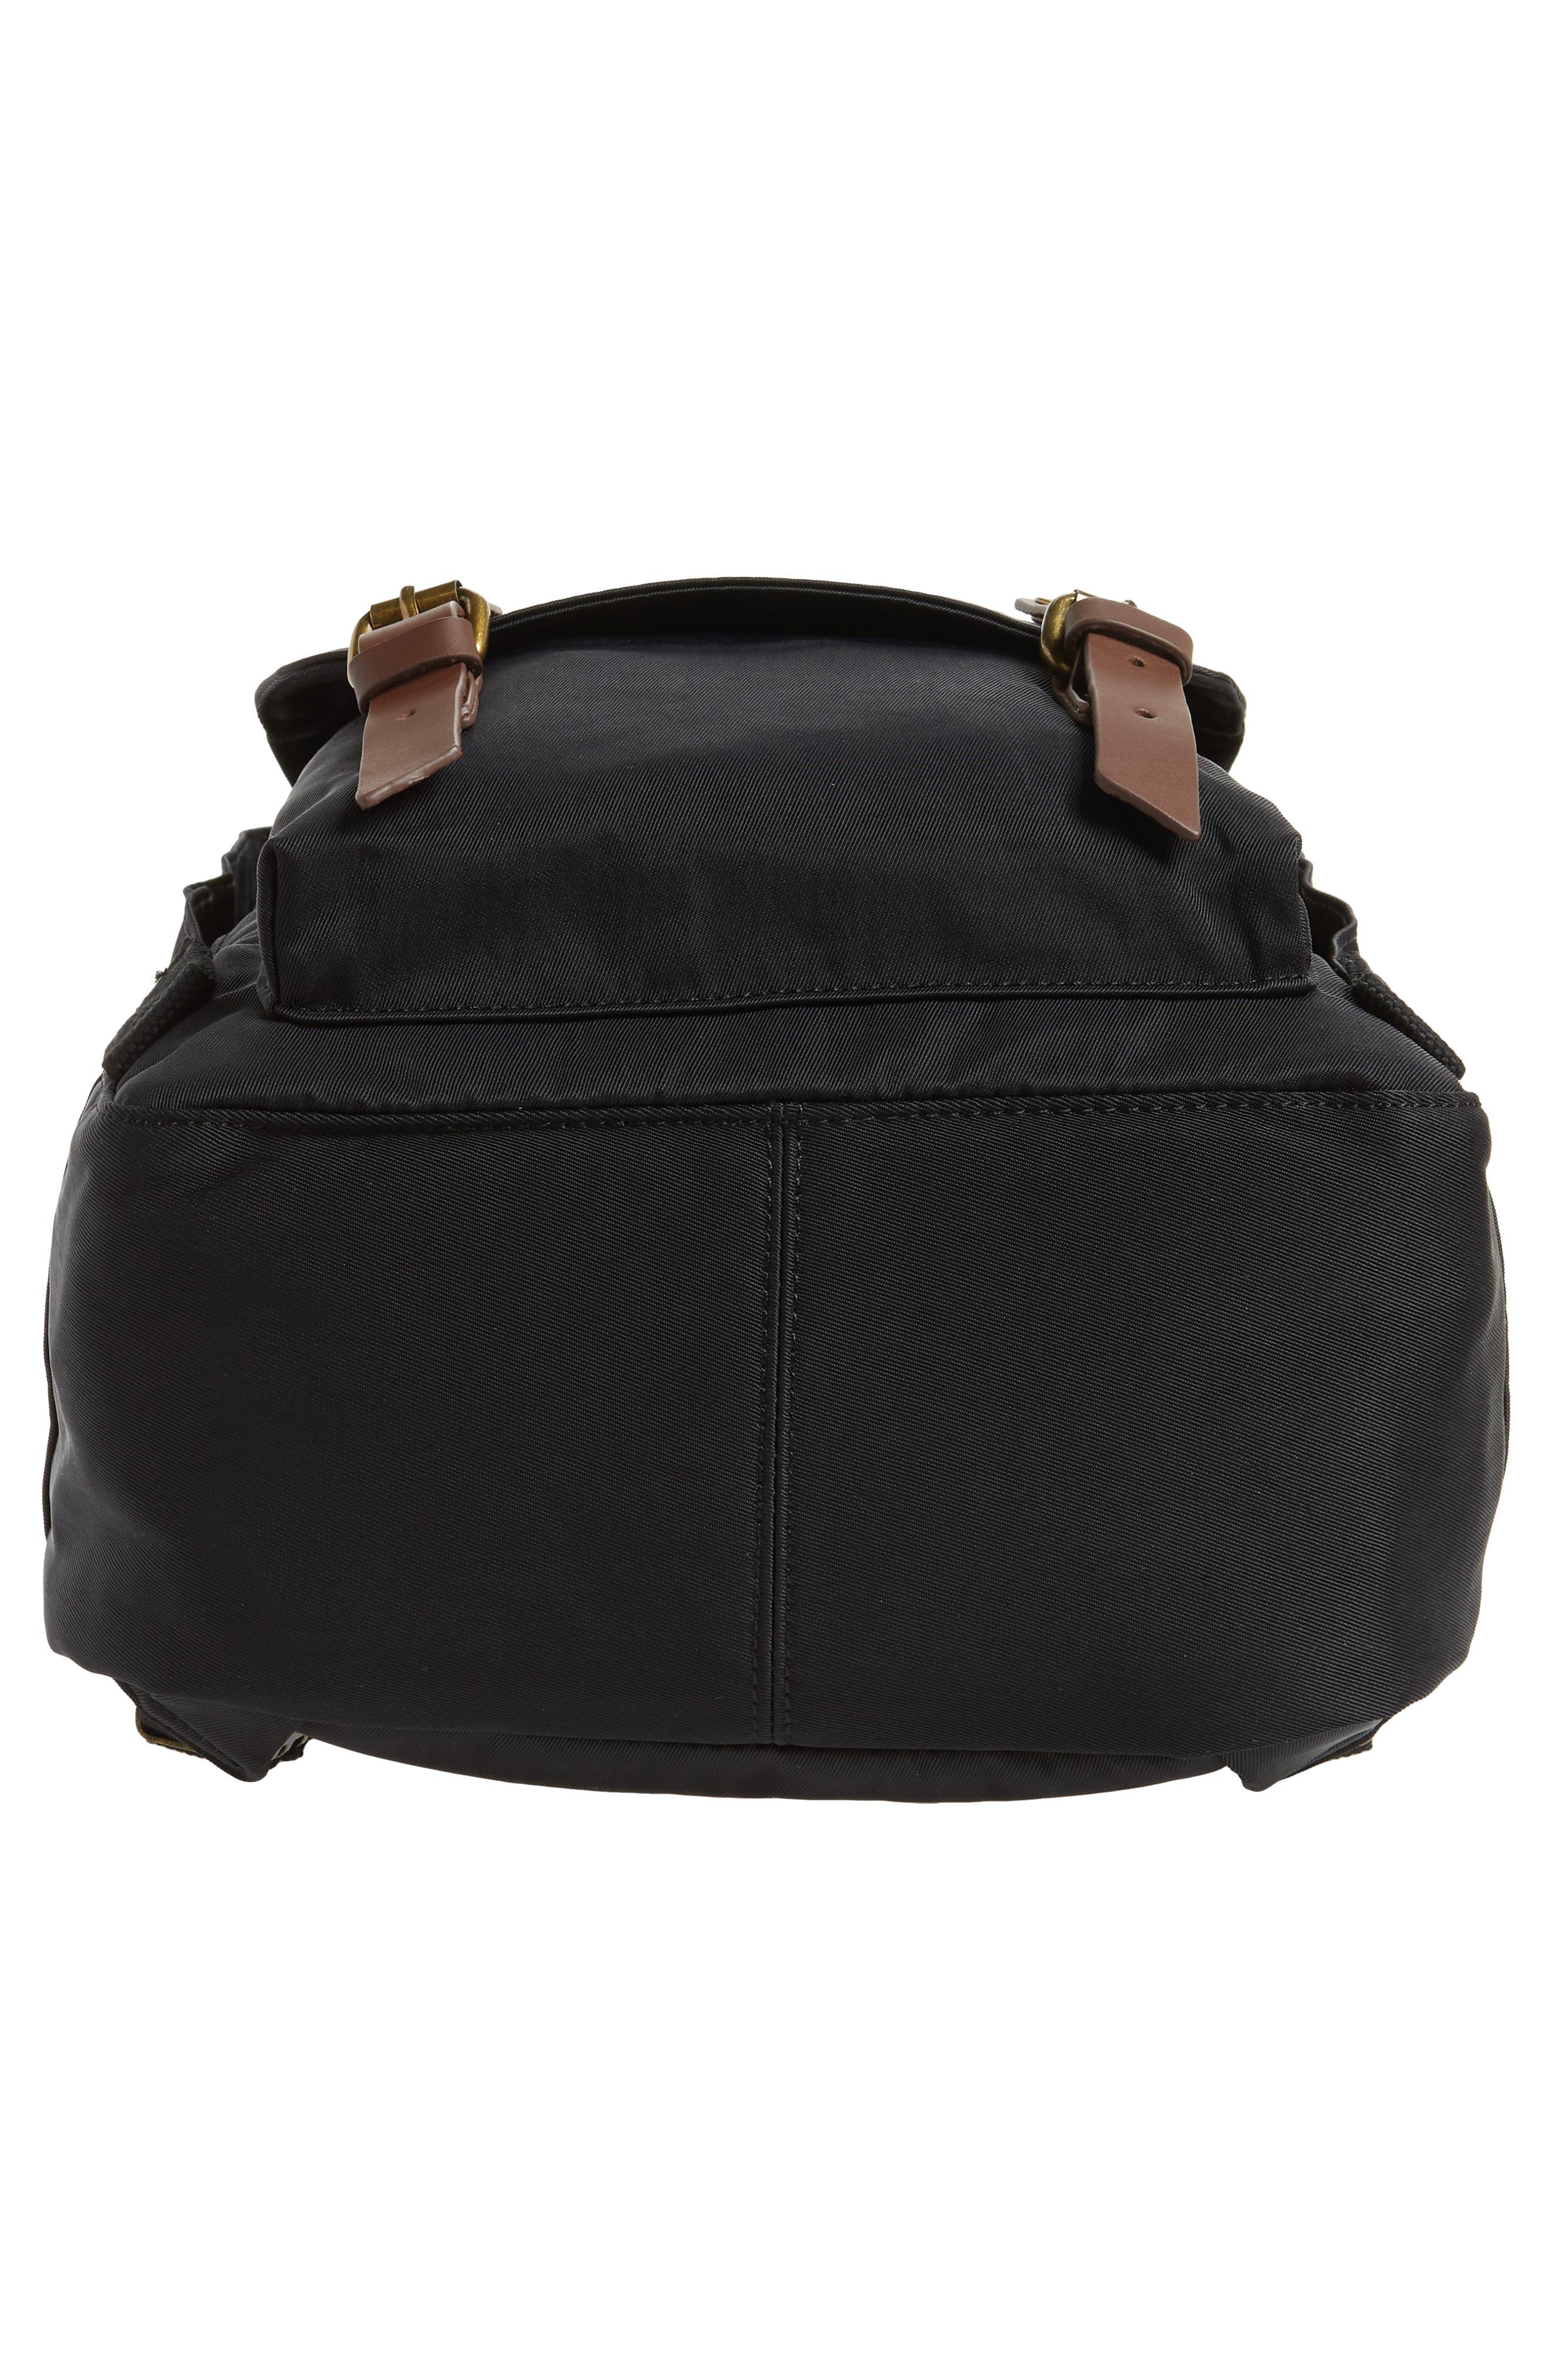 Macaroon Water Resistant Backpack,                             Alternate thumbnail 6, color,                             BLACK